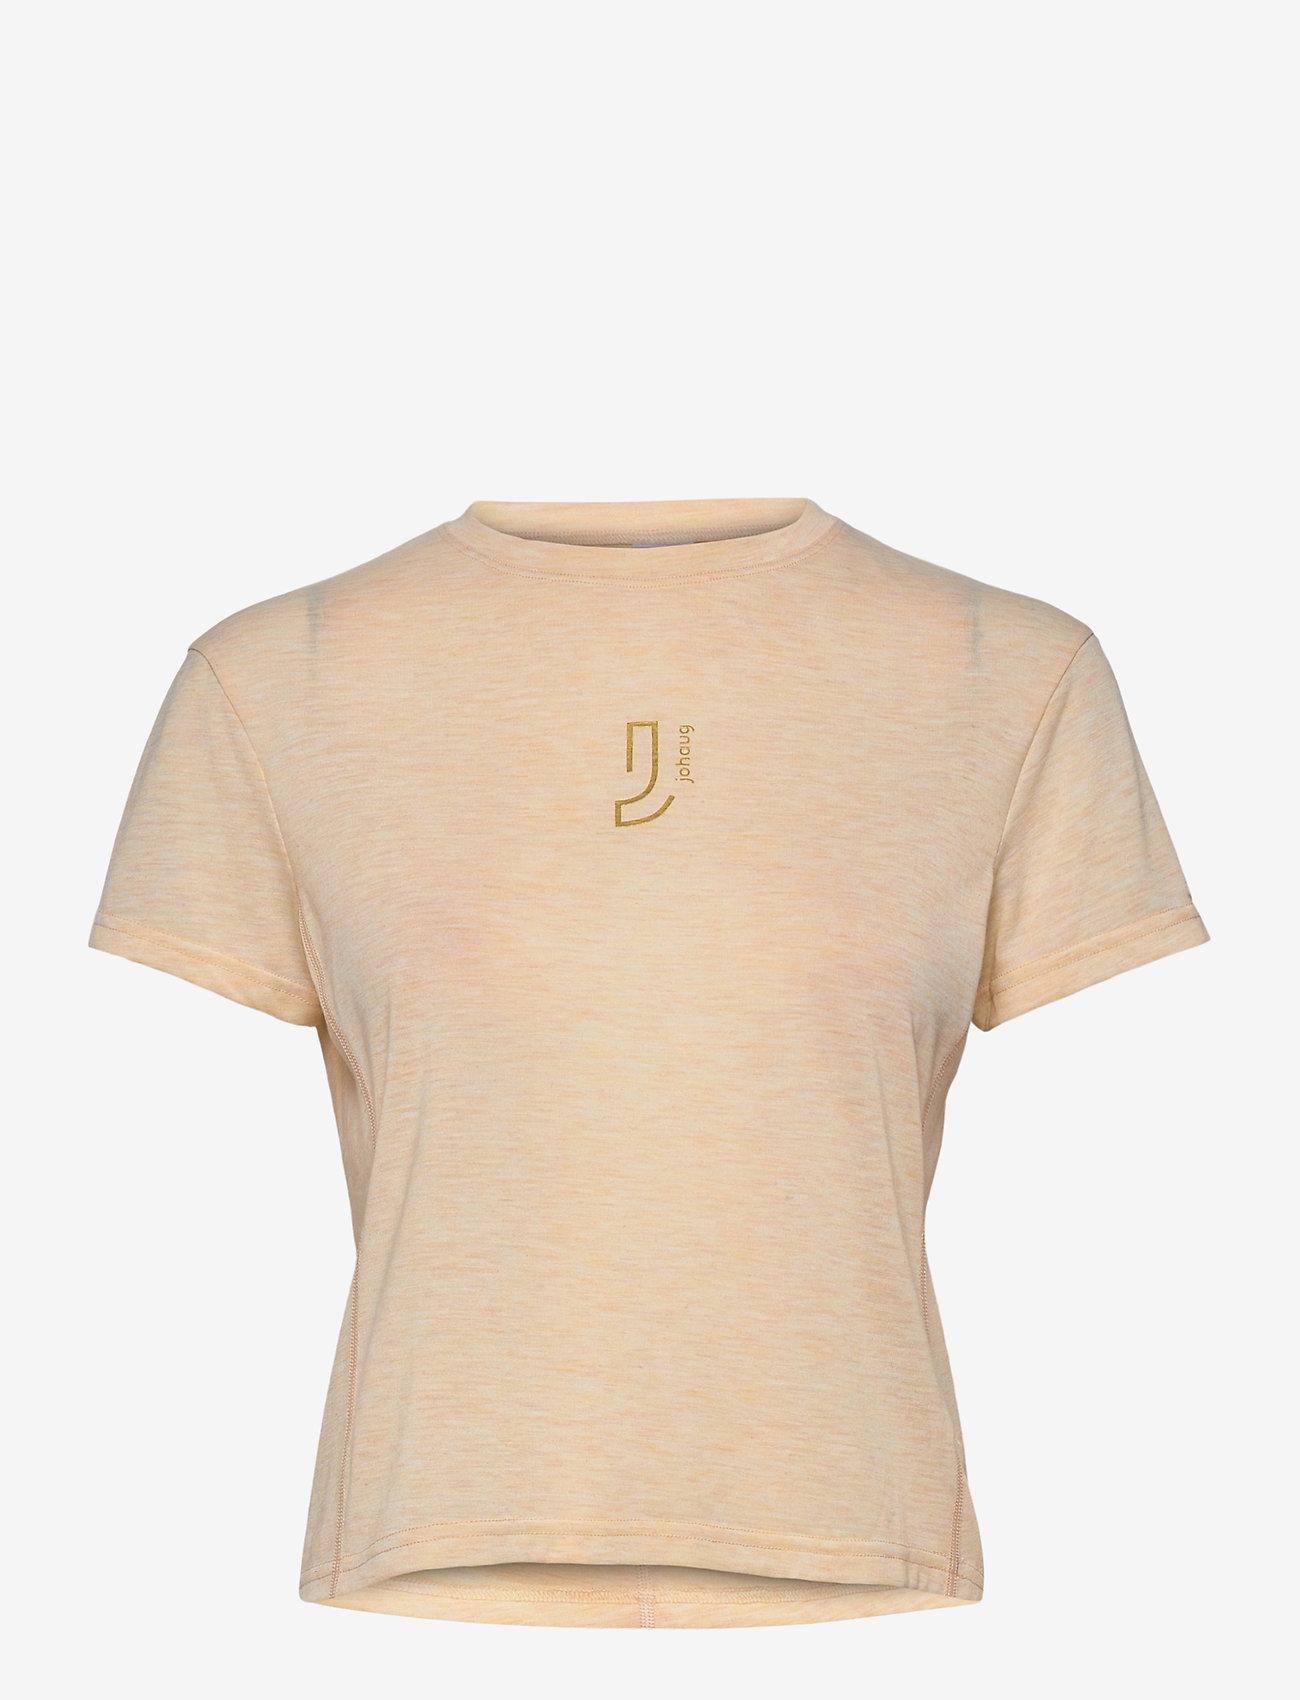 Johaug - Aerial Woolmix Tee - t-shirts - skiss - 0